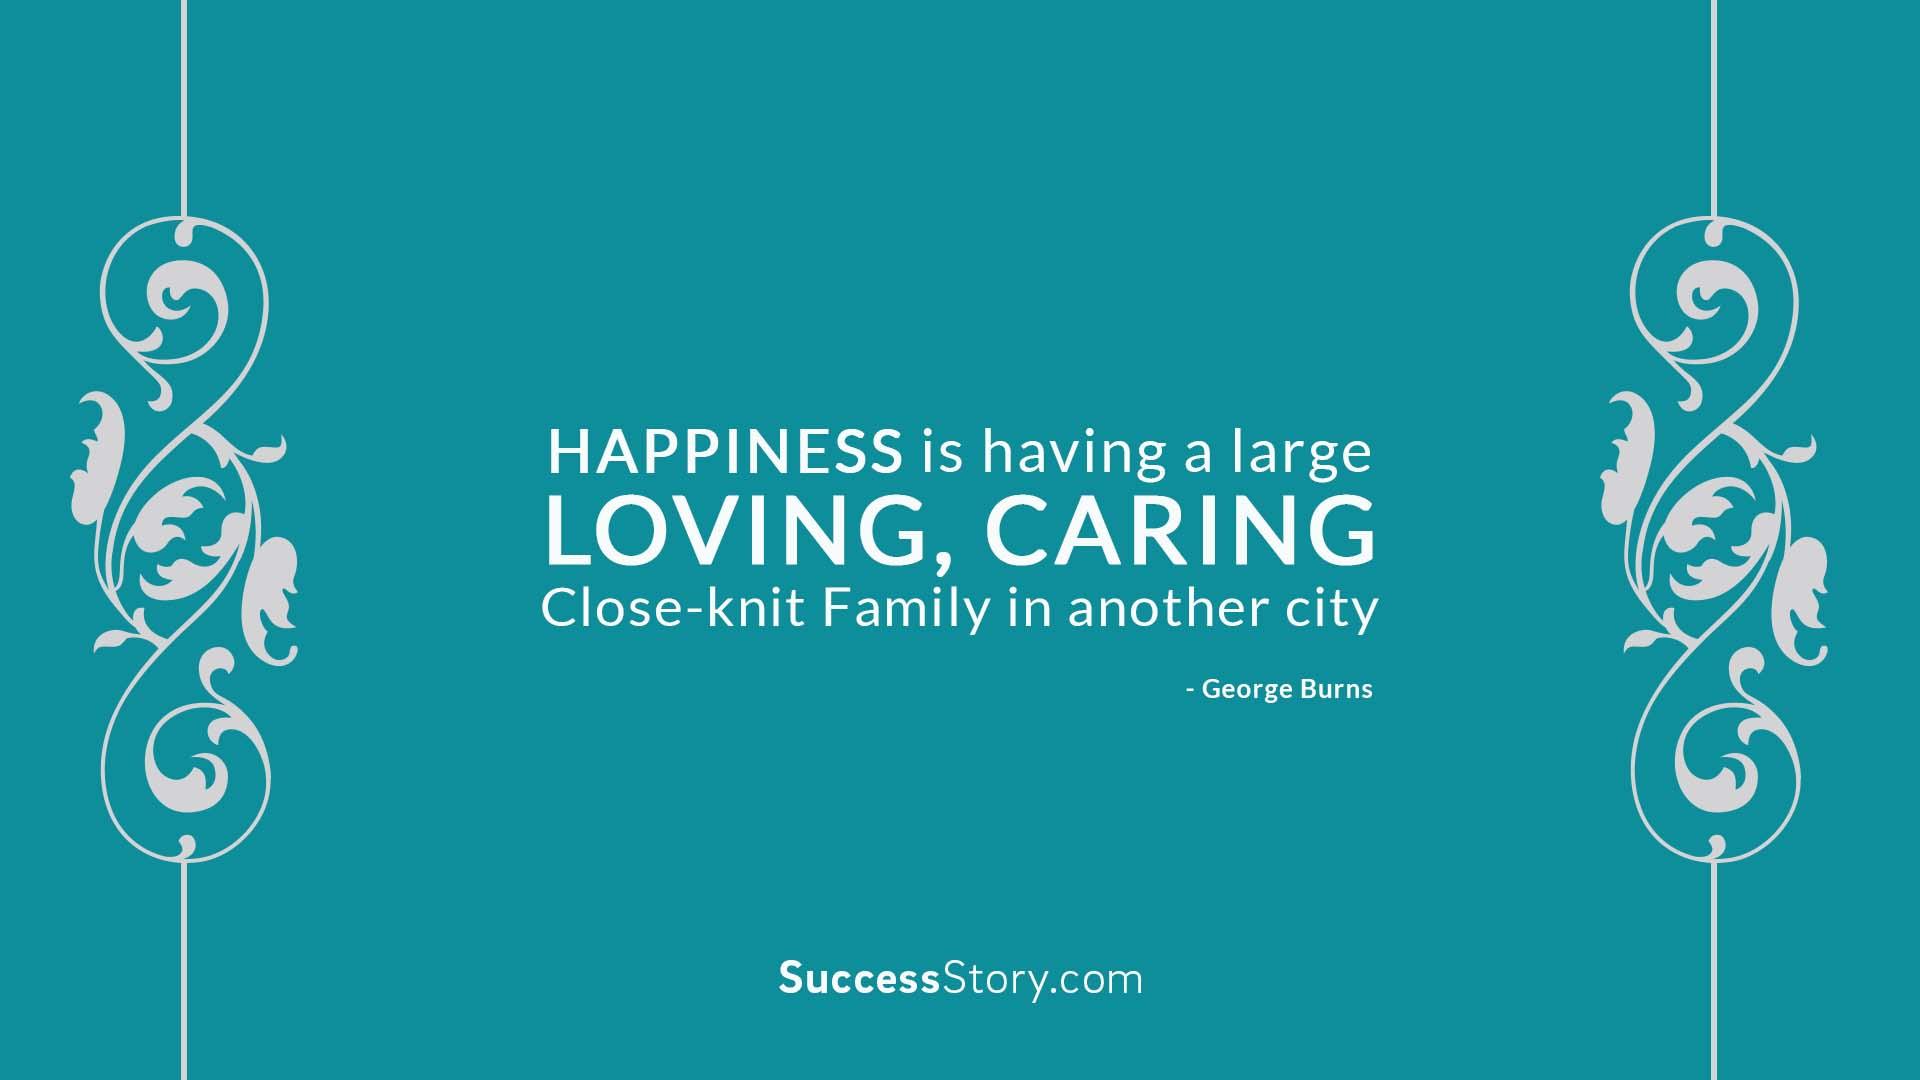 Happiness is having